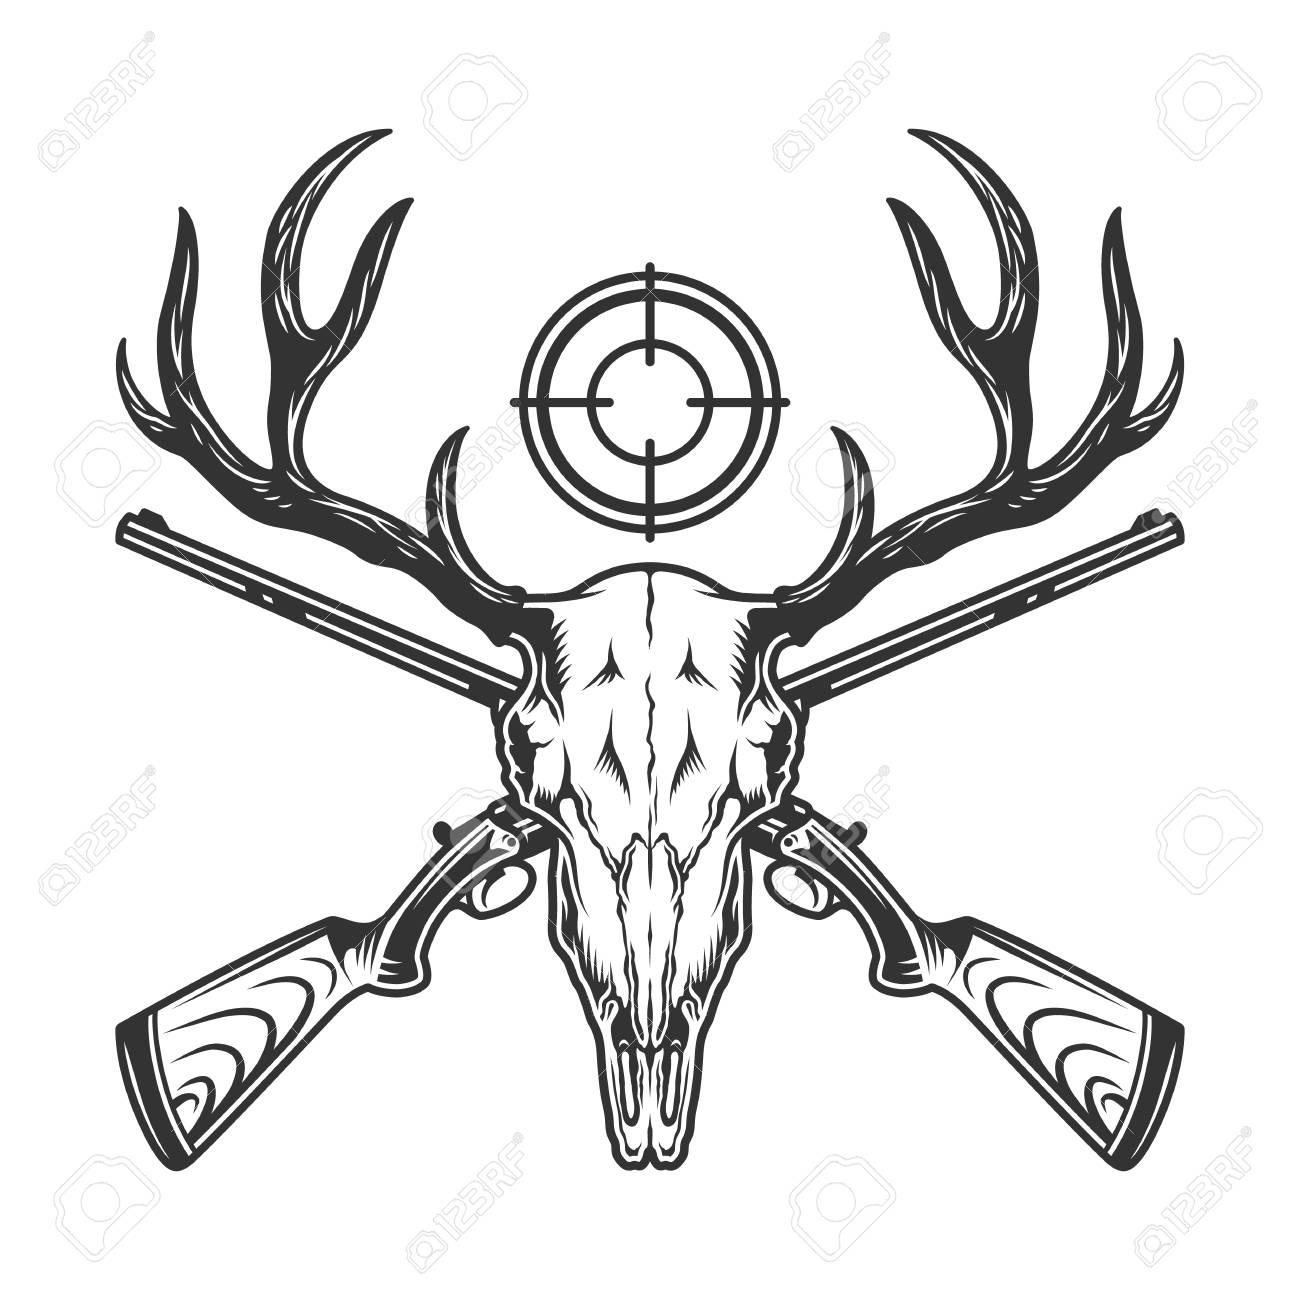 Vintage Monochrome Hunting Template With Deer Skull Crossed Guns